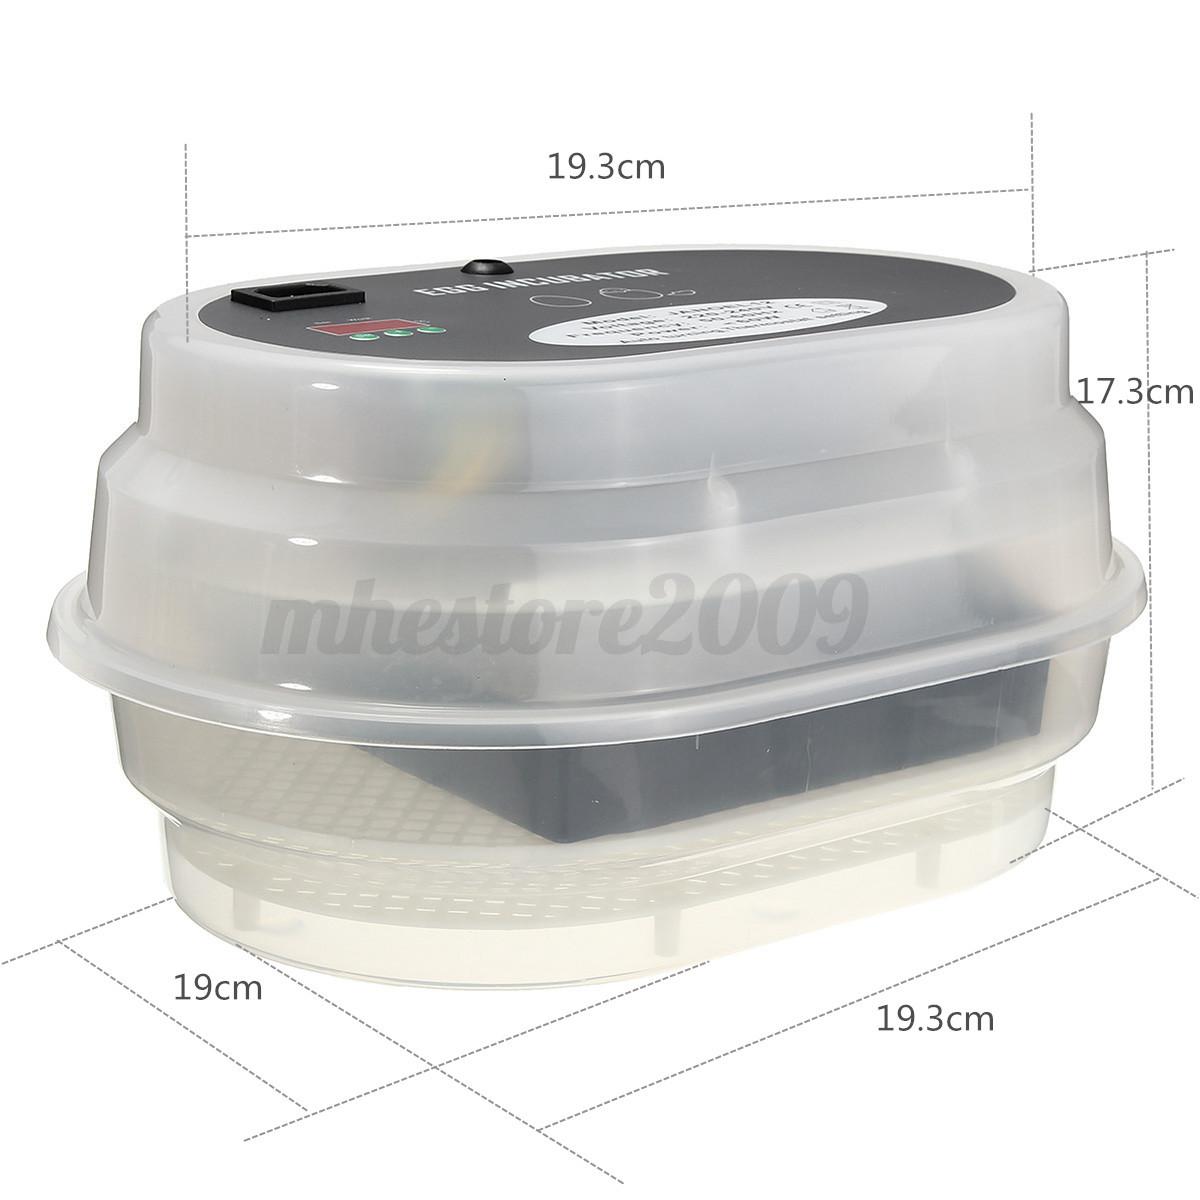 Cabinet Incubator Kit 912 Egg Incubator Digital Automatic Turning Chicken Hatcher